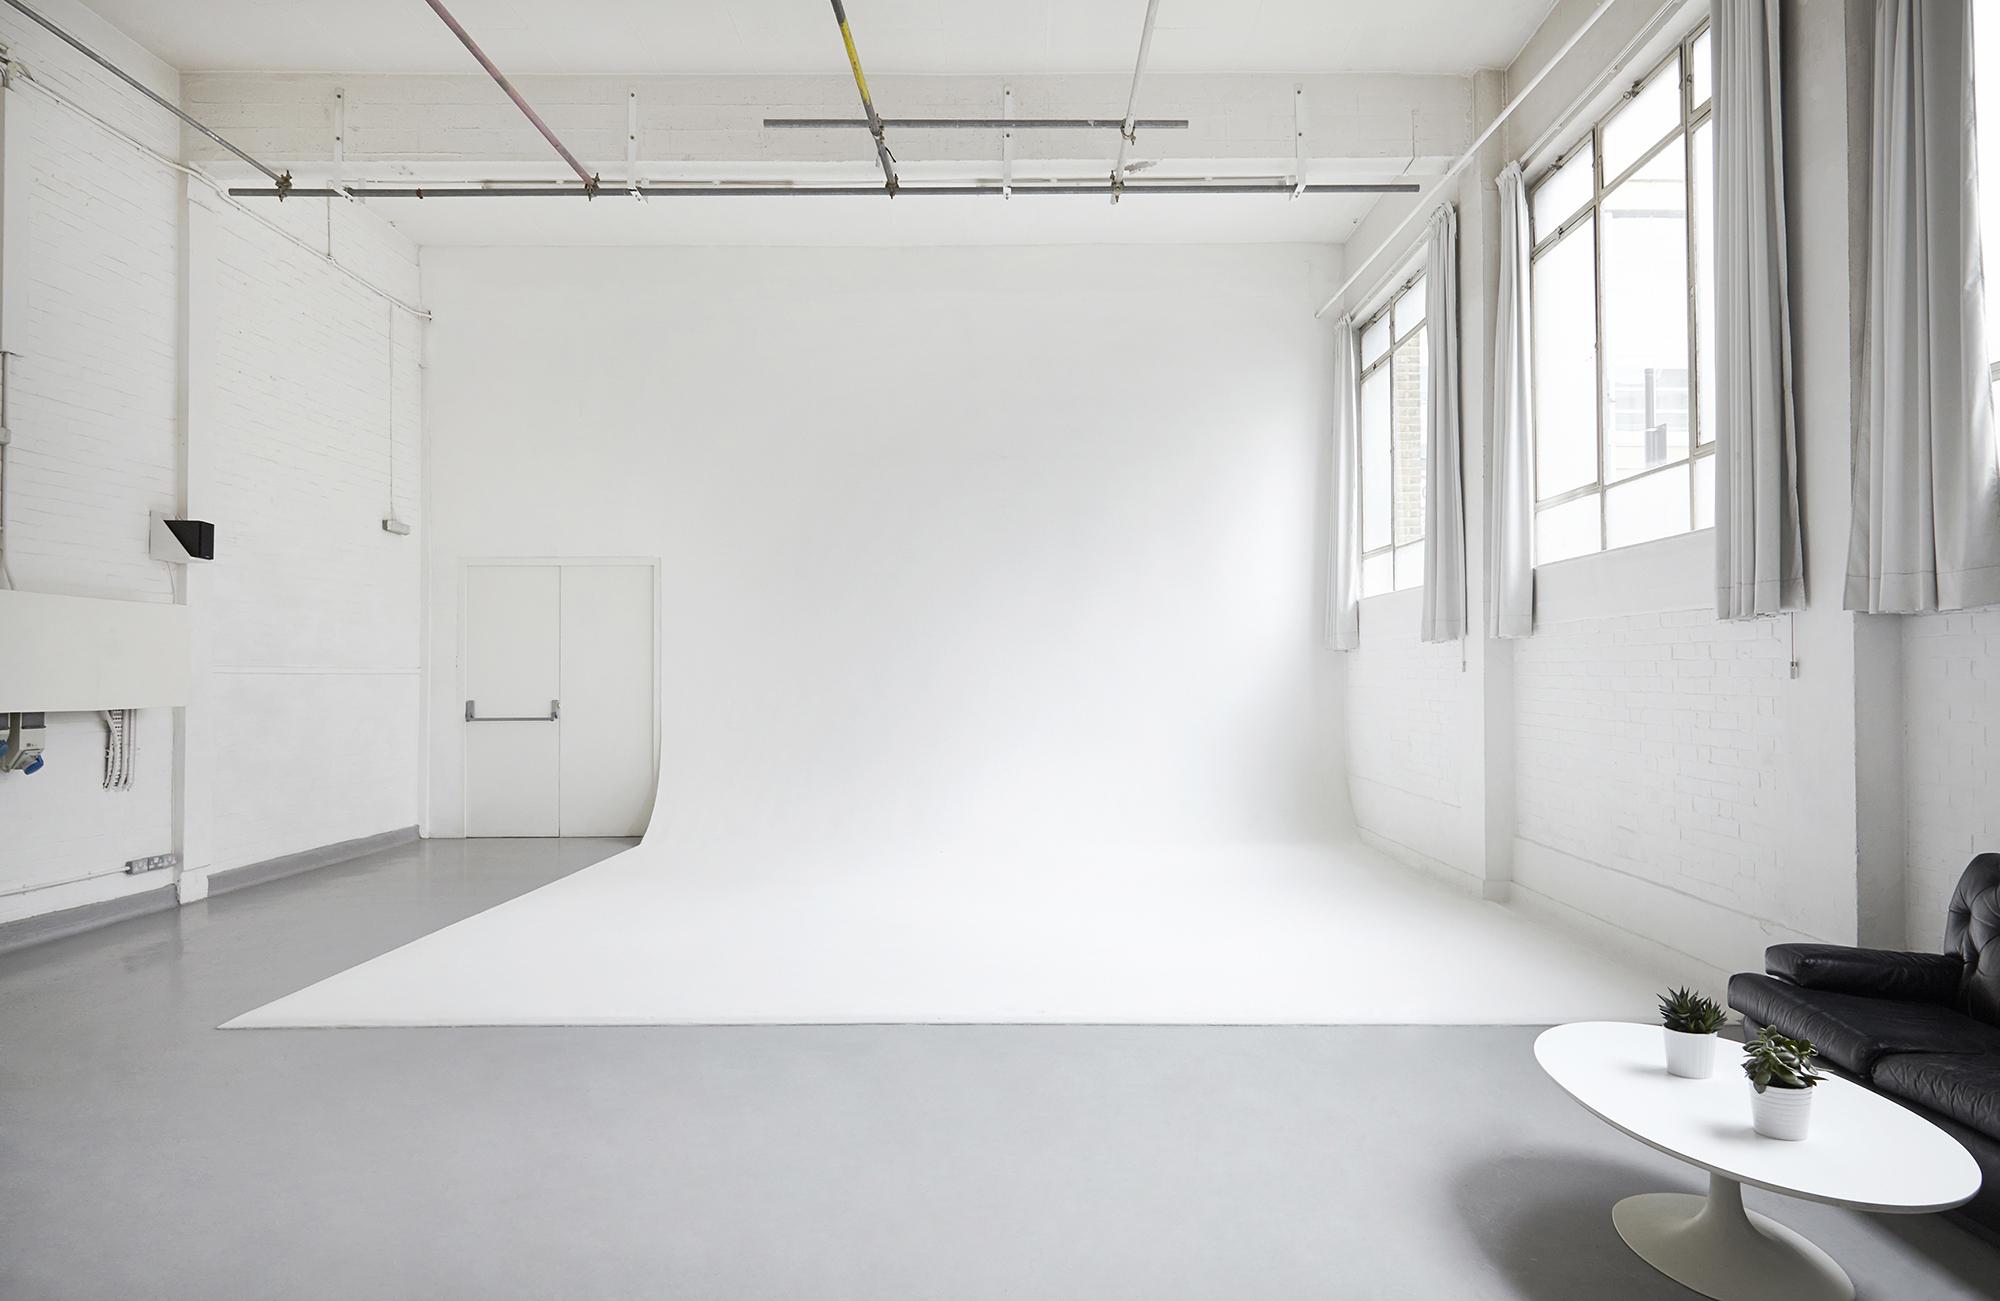 Studio 3 - front on.jpg